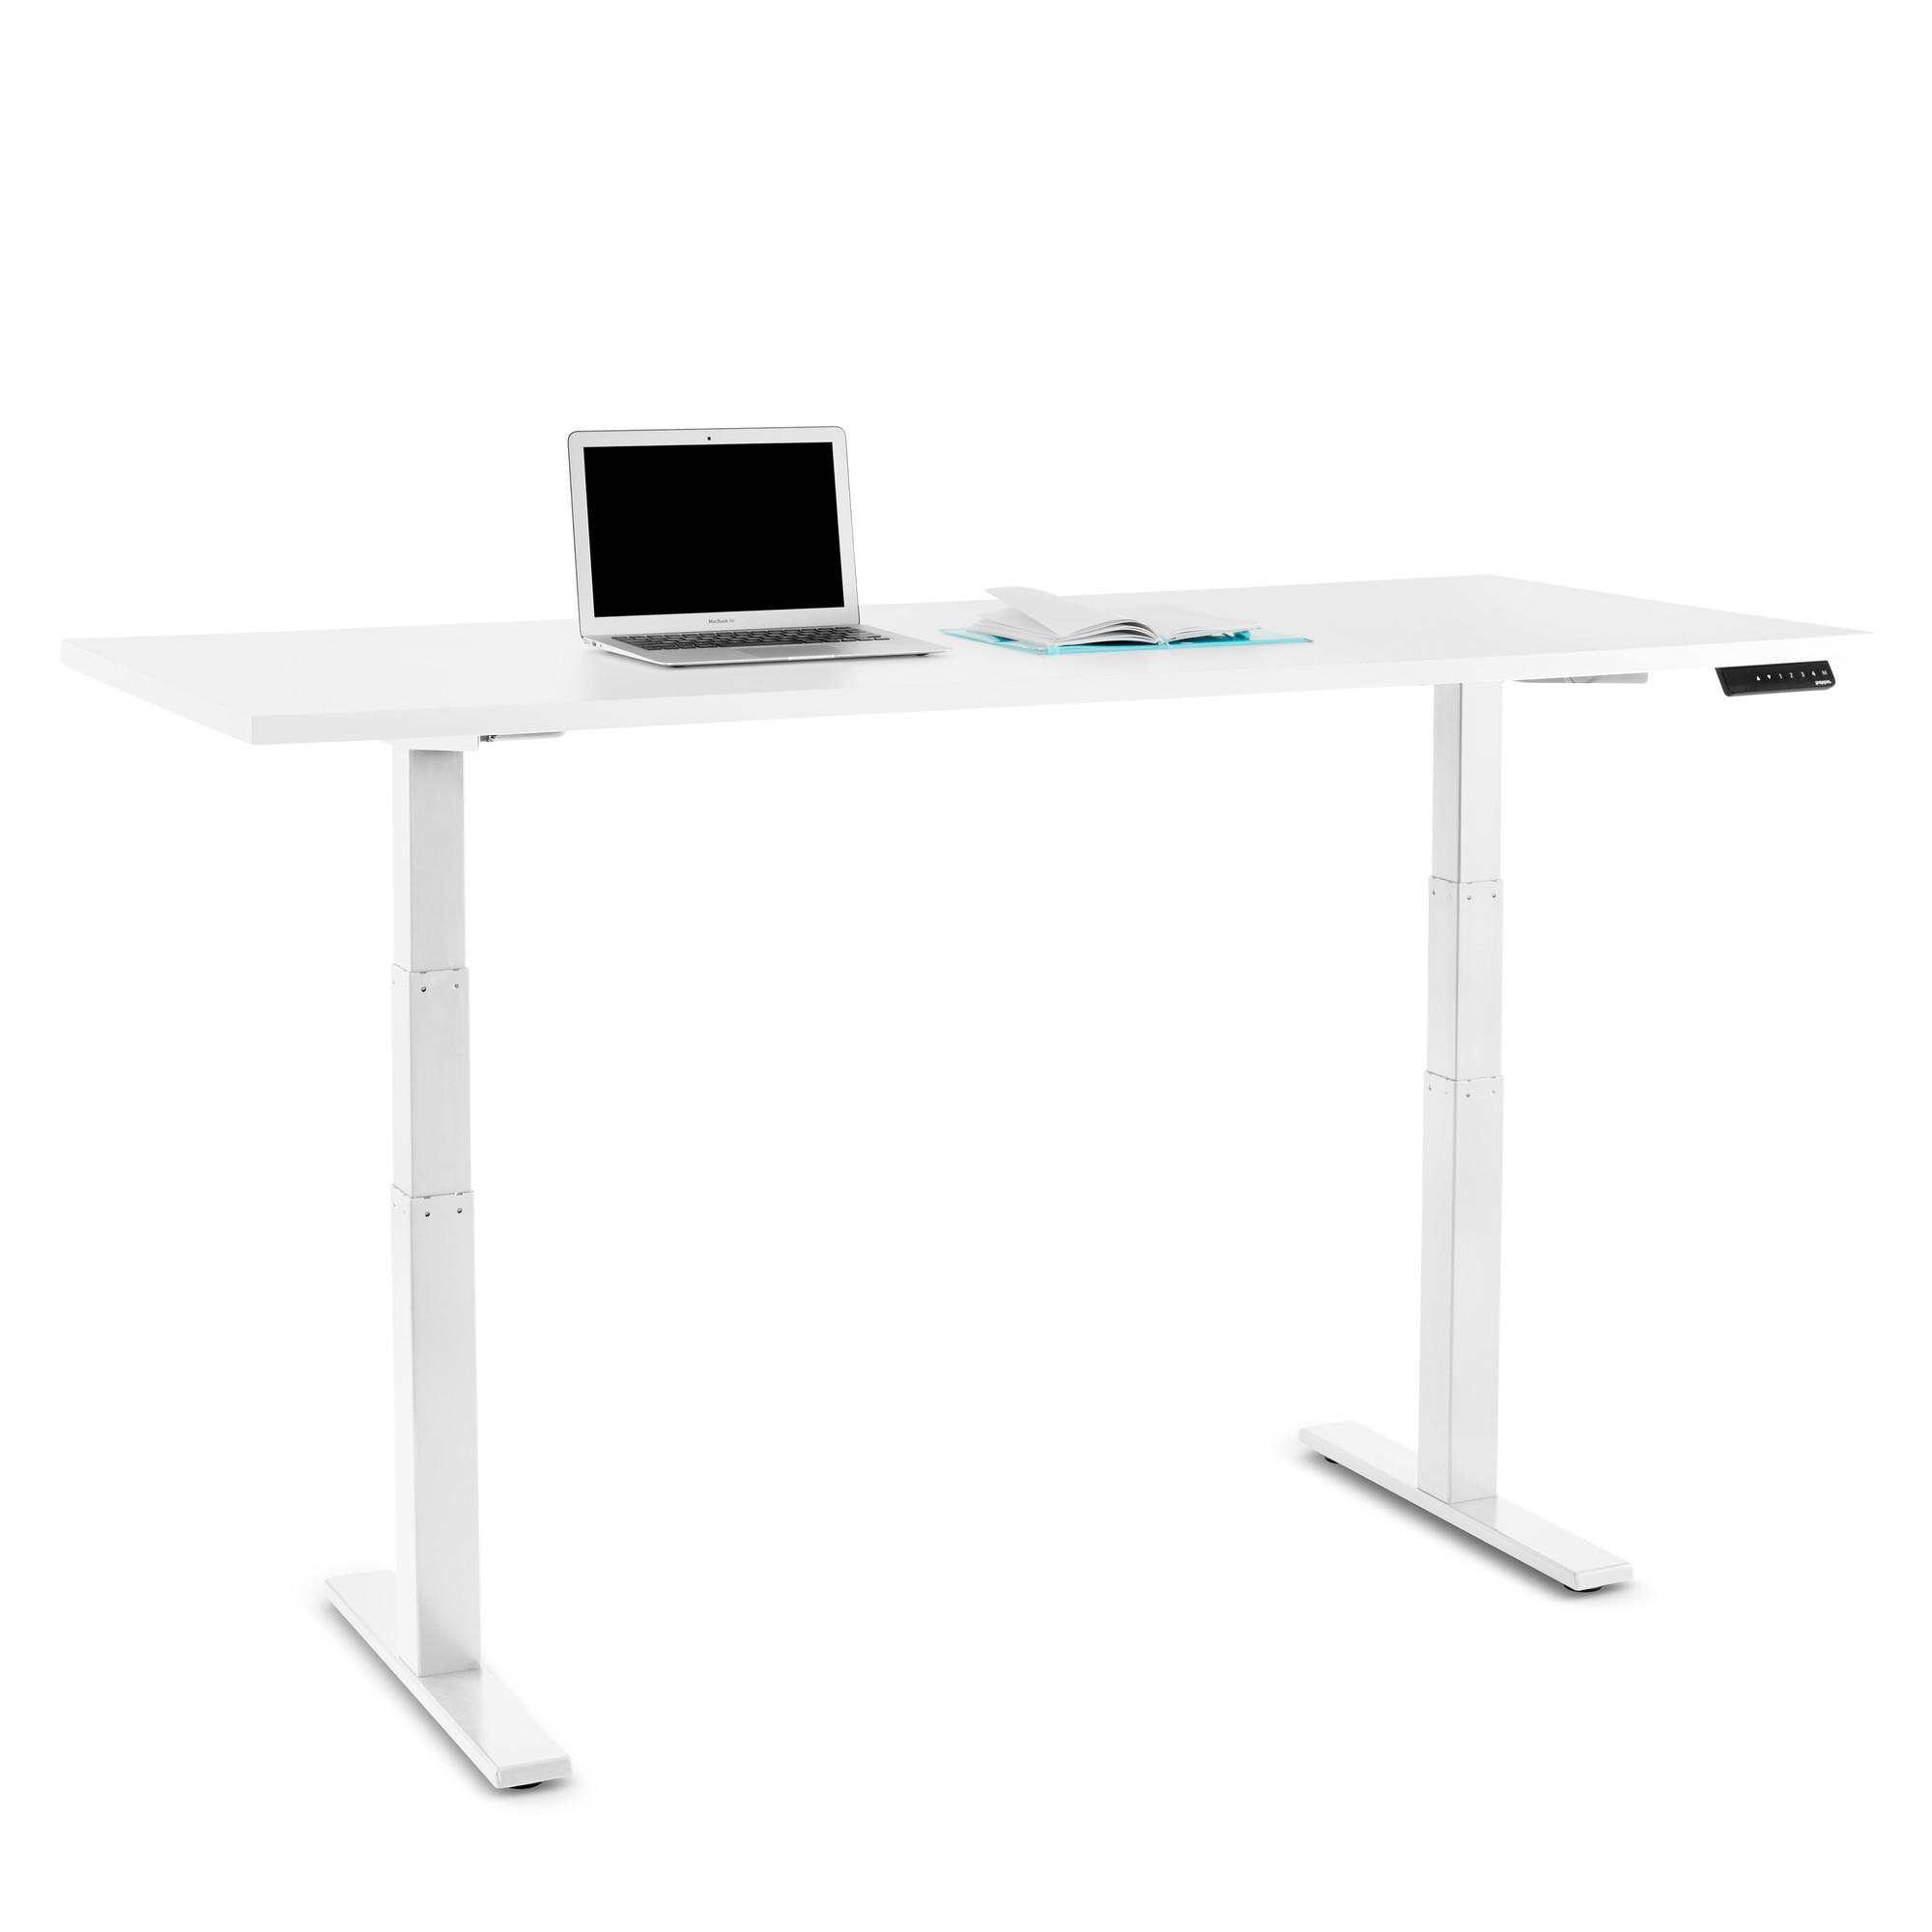 Series L Adjustable Height Table White Legs Adjustable Height Desks Poppin